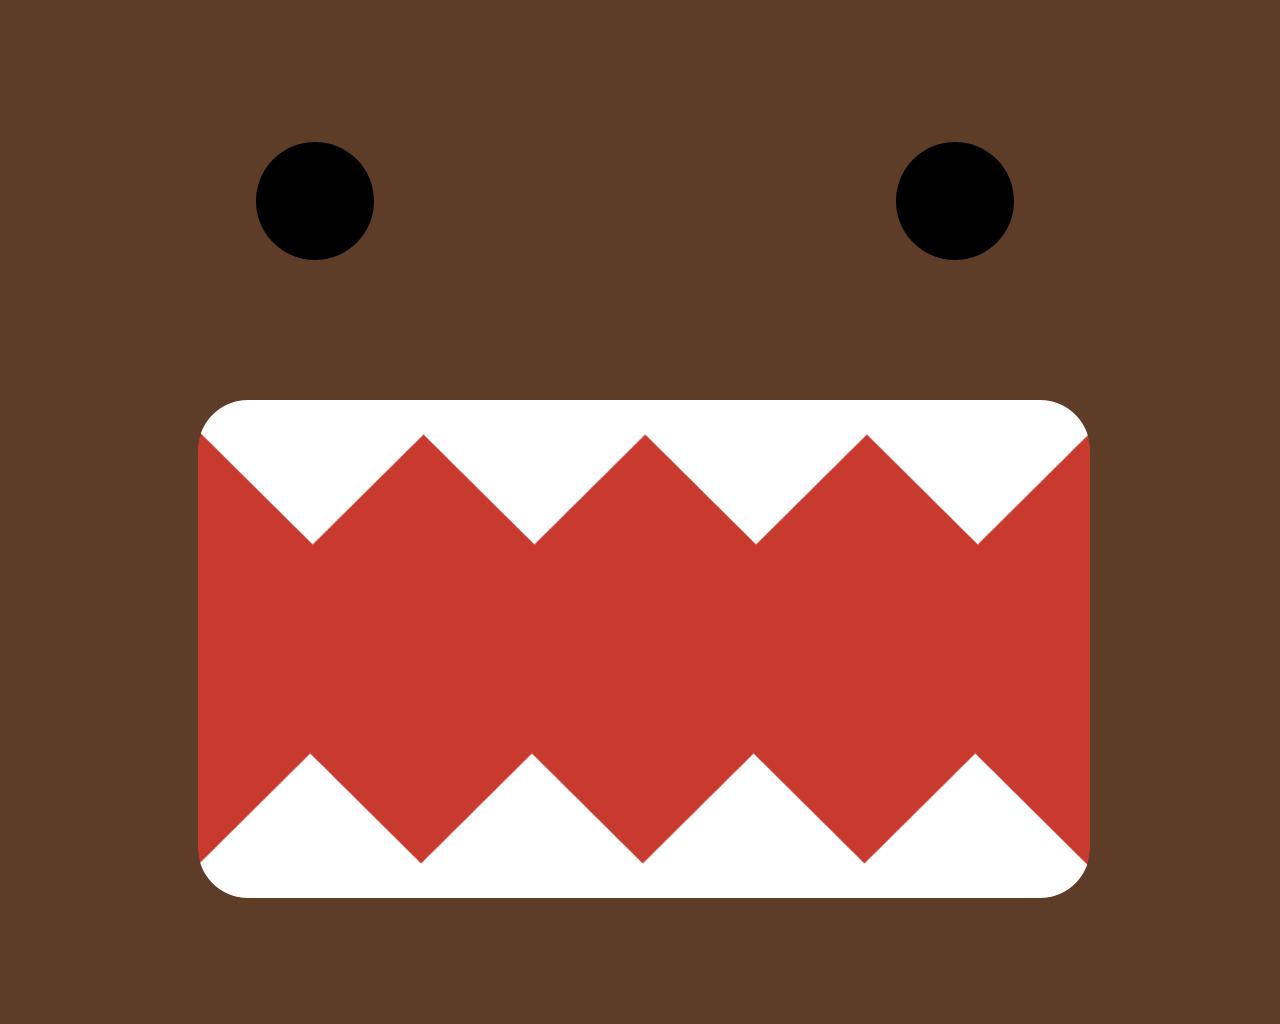 domo kun nhk s mascot wallpaper domo kun nhk s mascot wallpaper domo 1280x1024